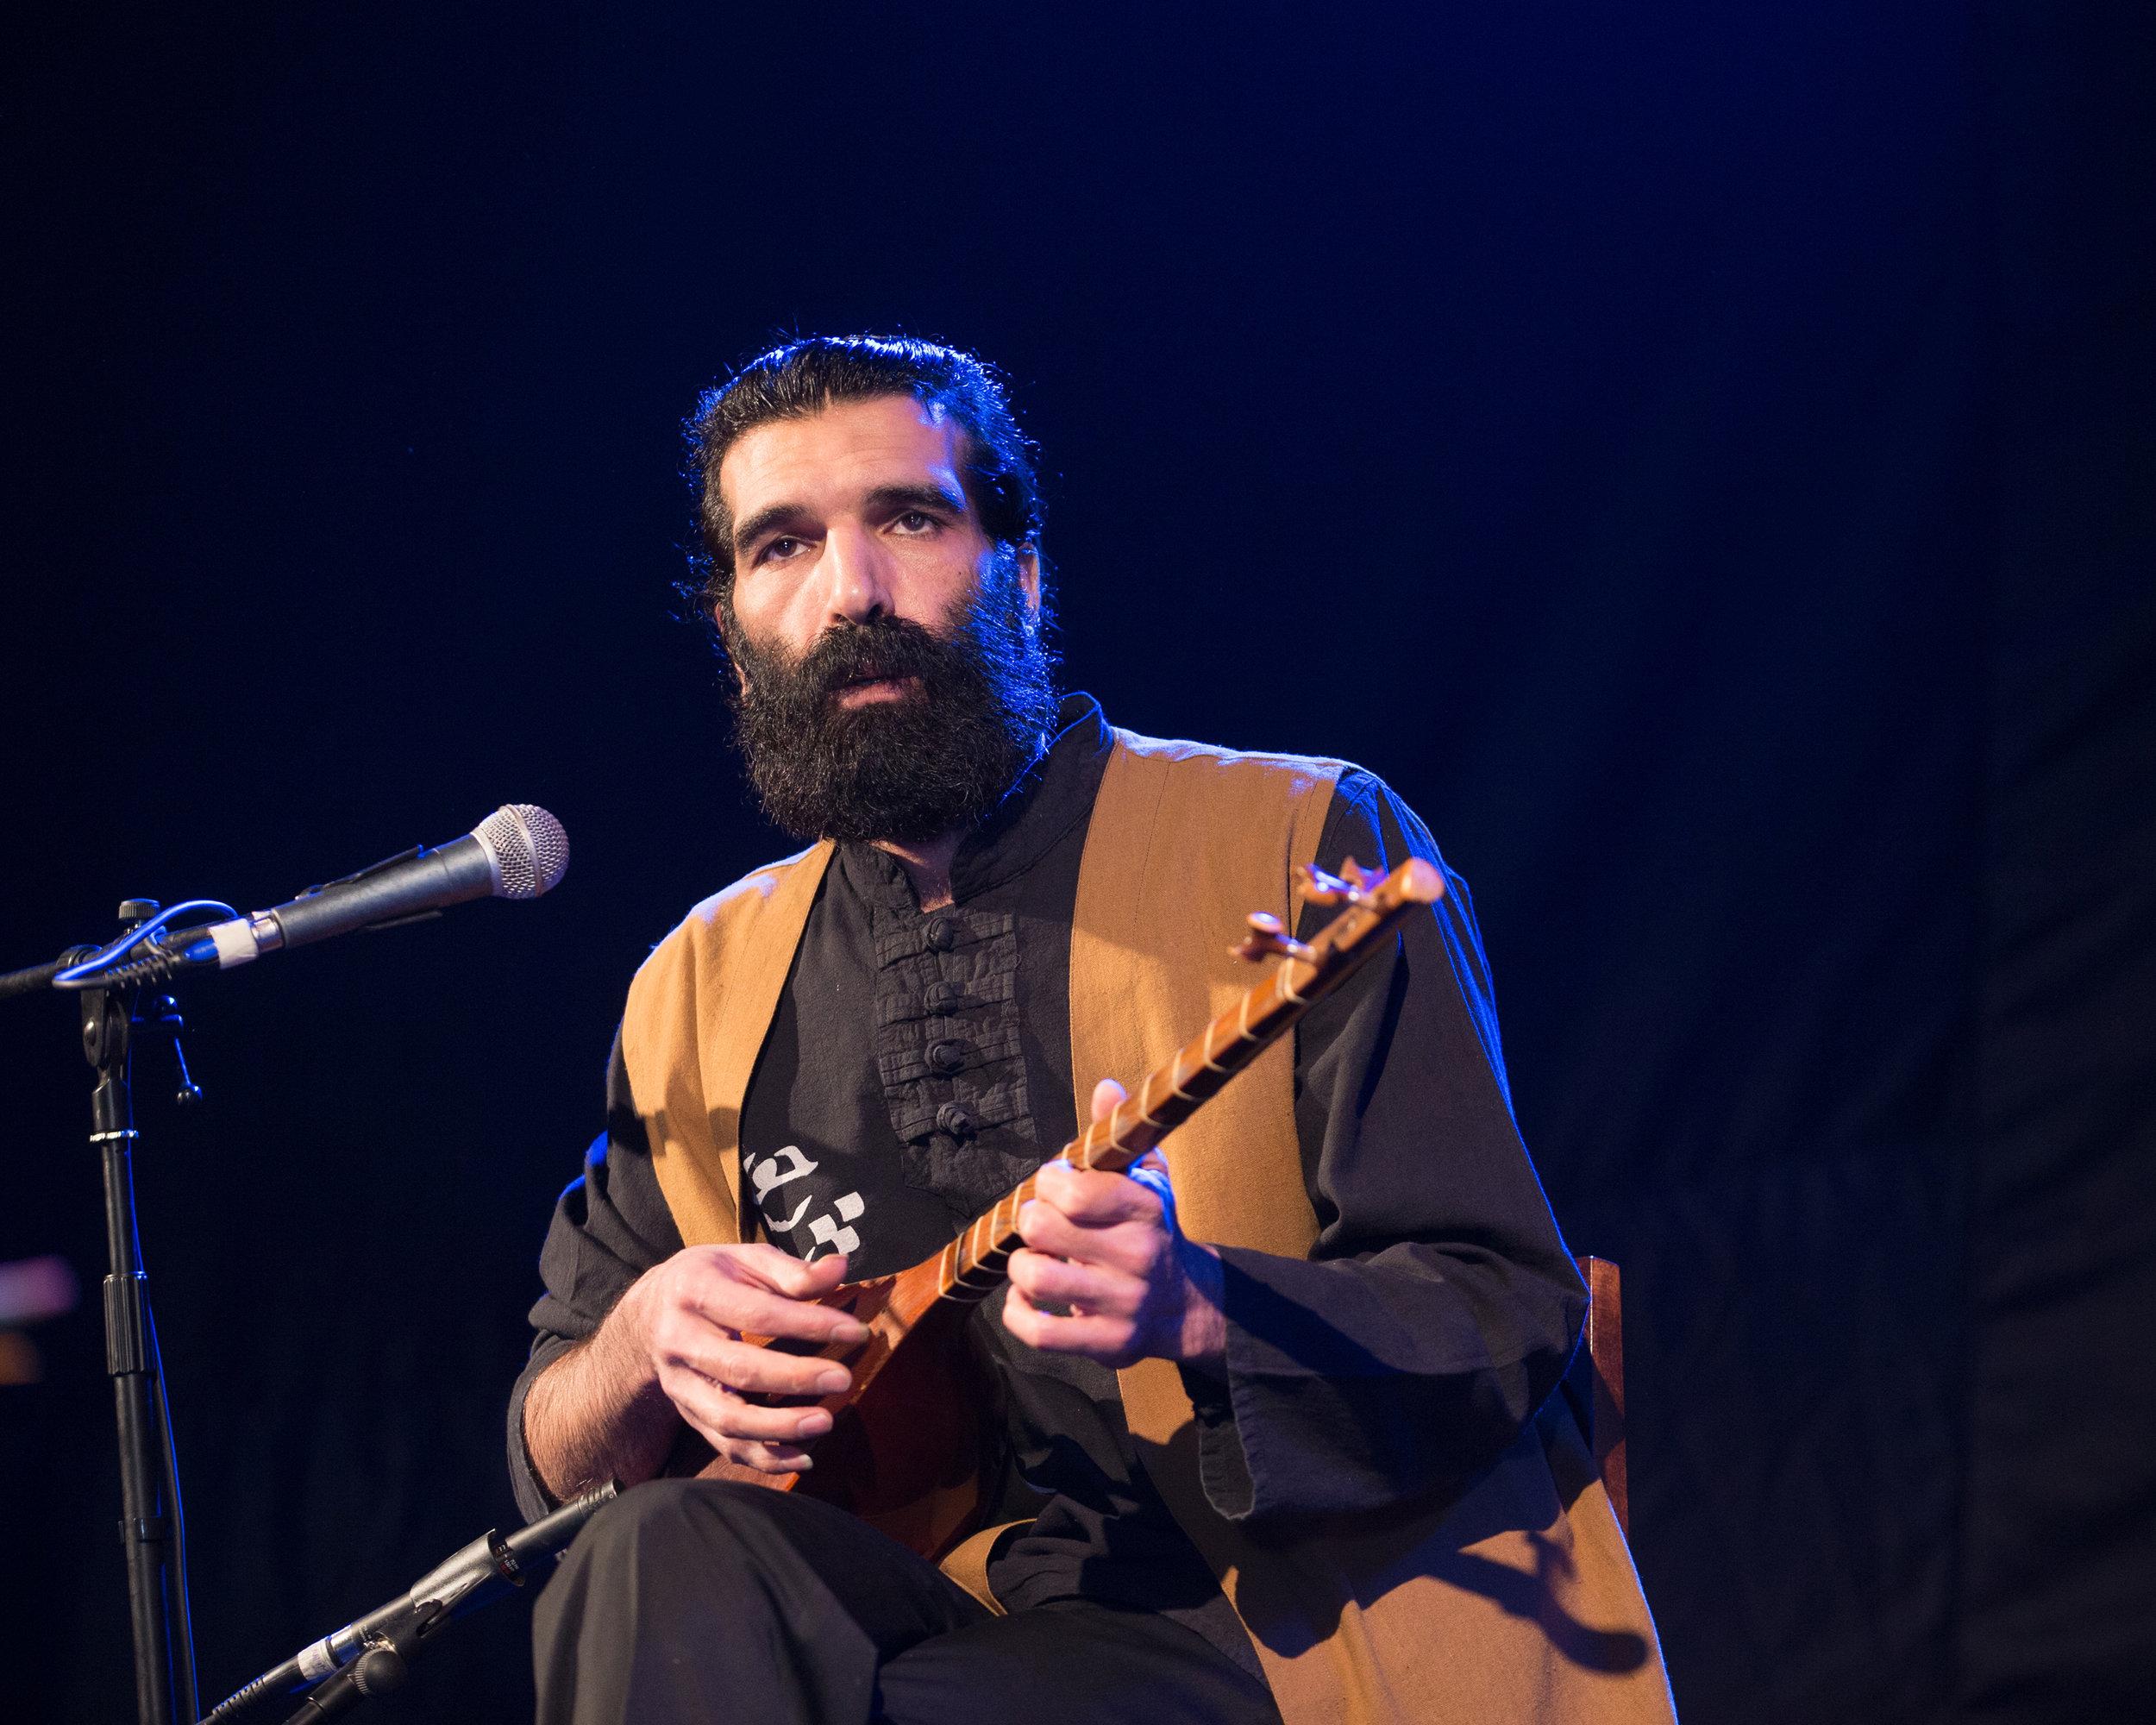 Ali Asghur Rahimi